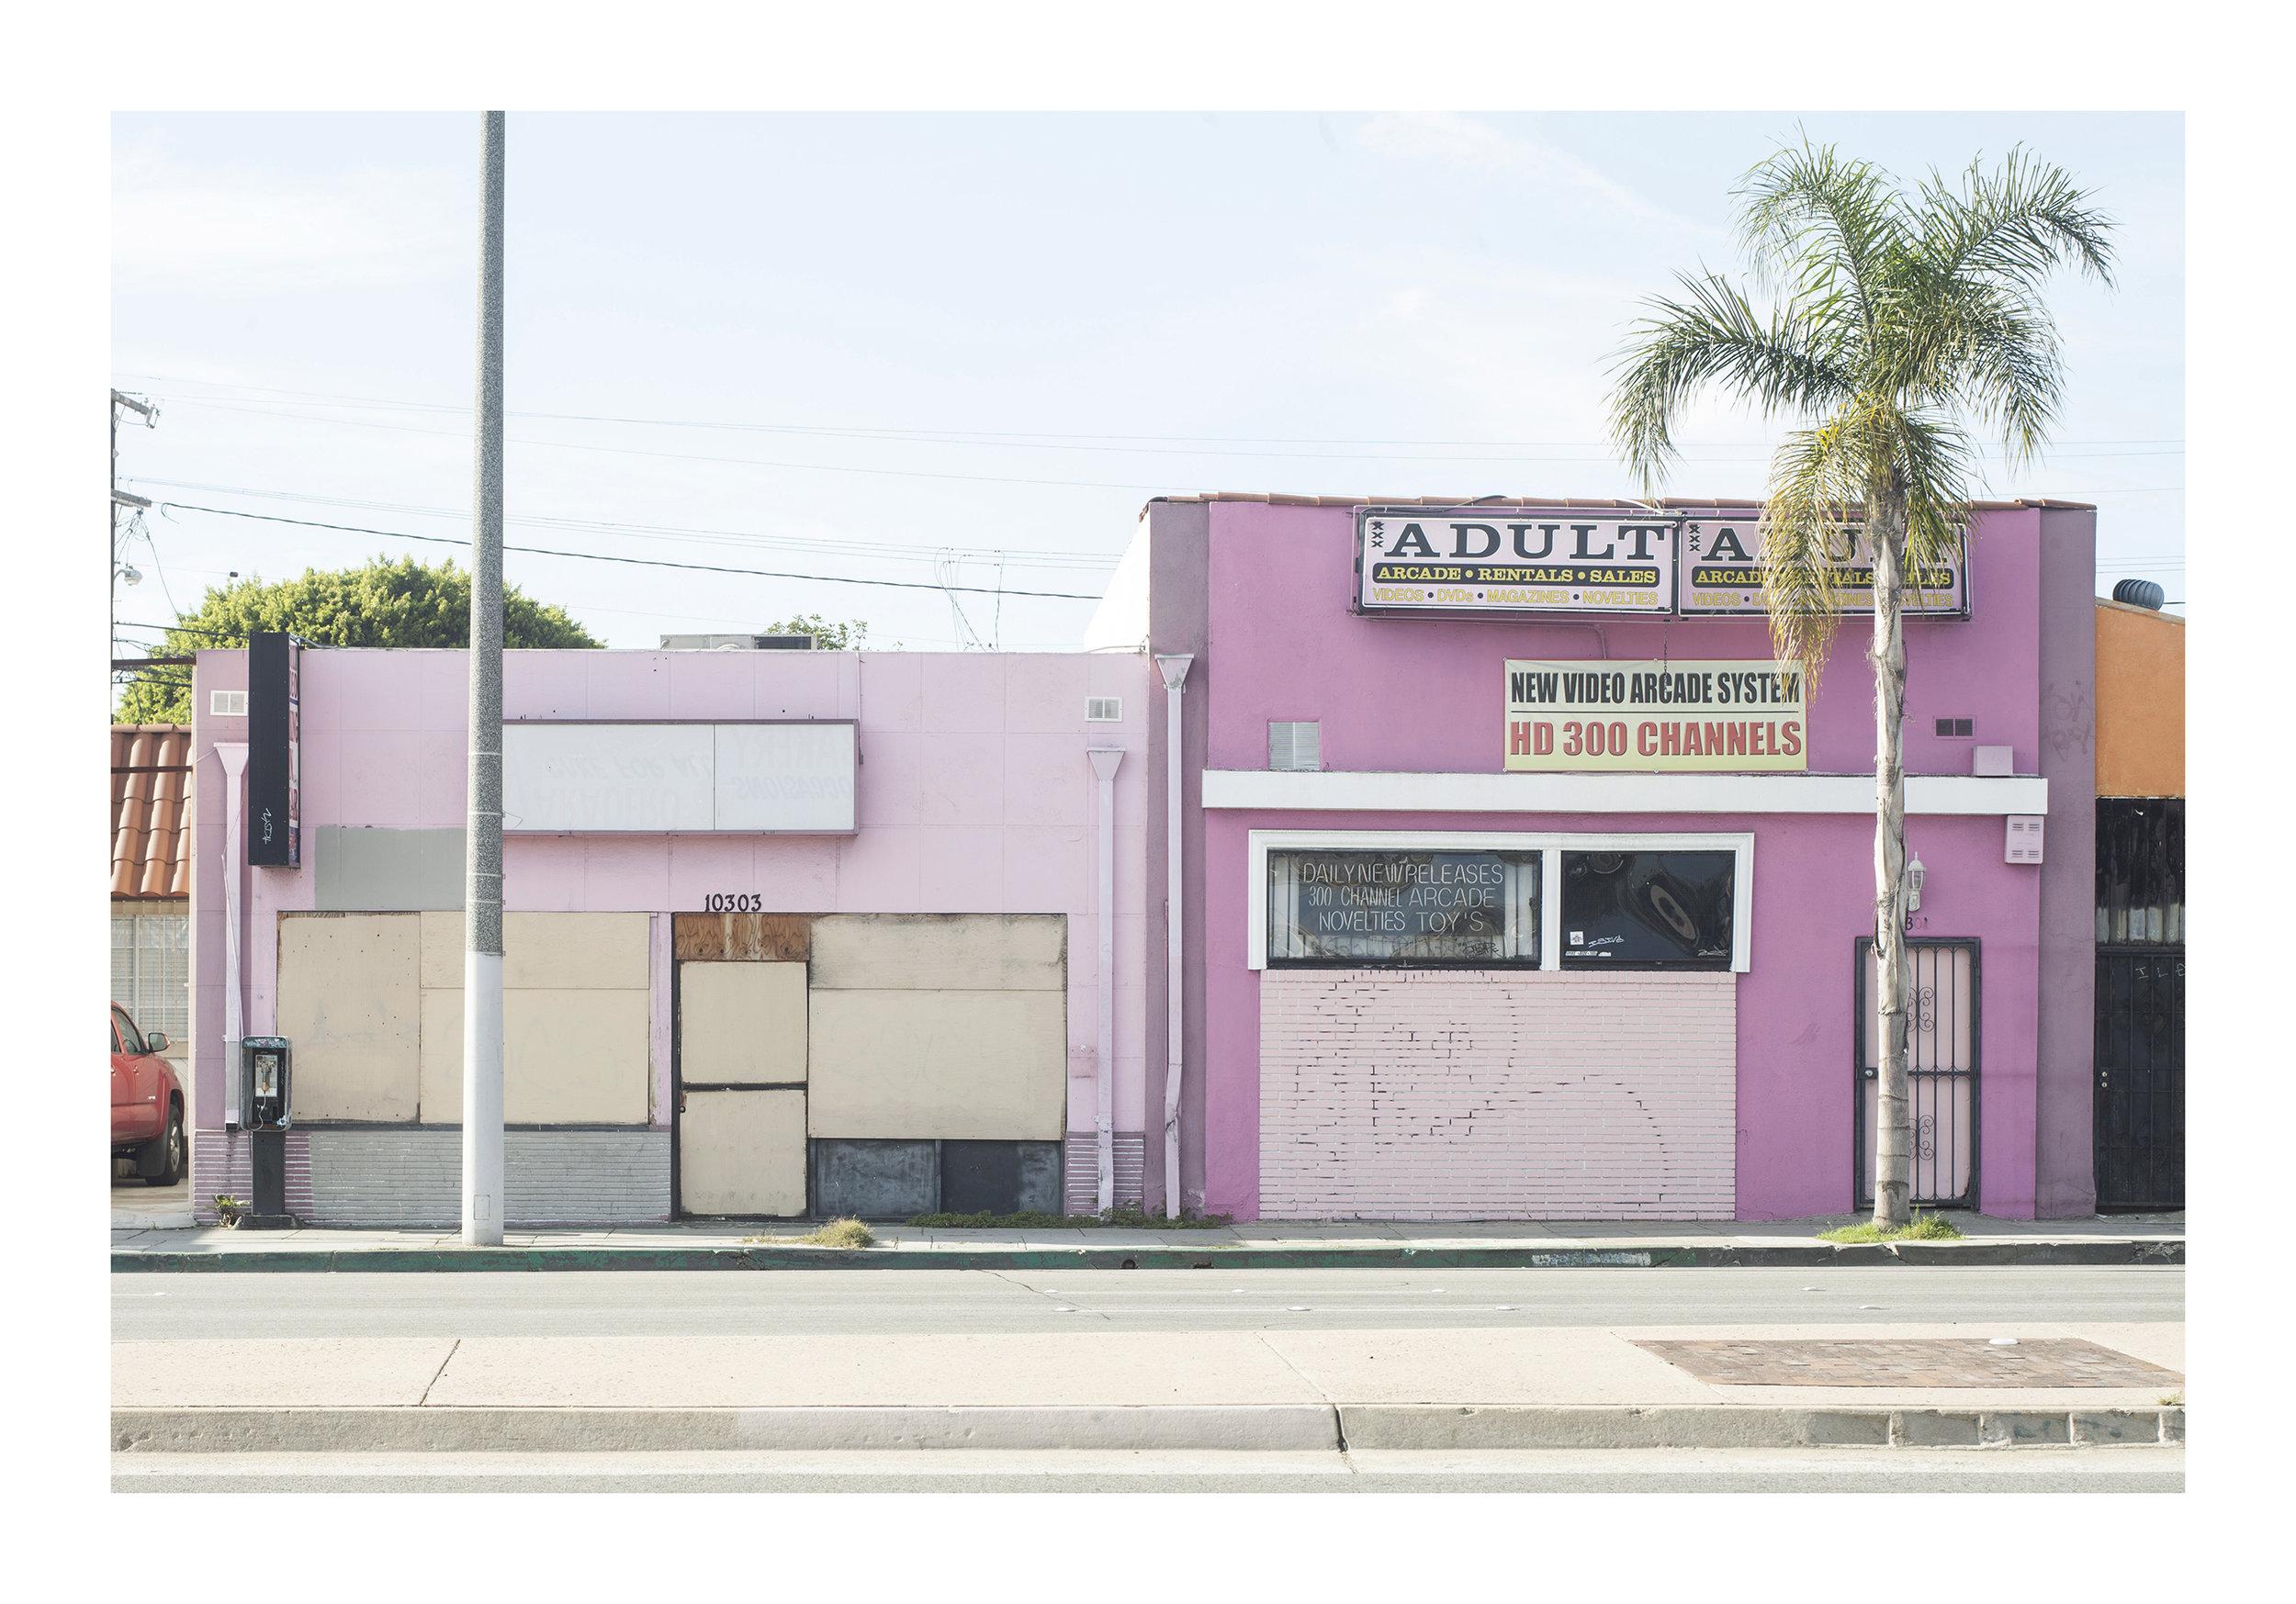 Adult Games Los Angeles, California 2017